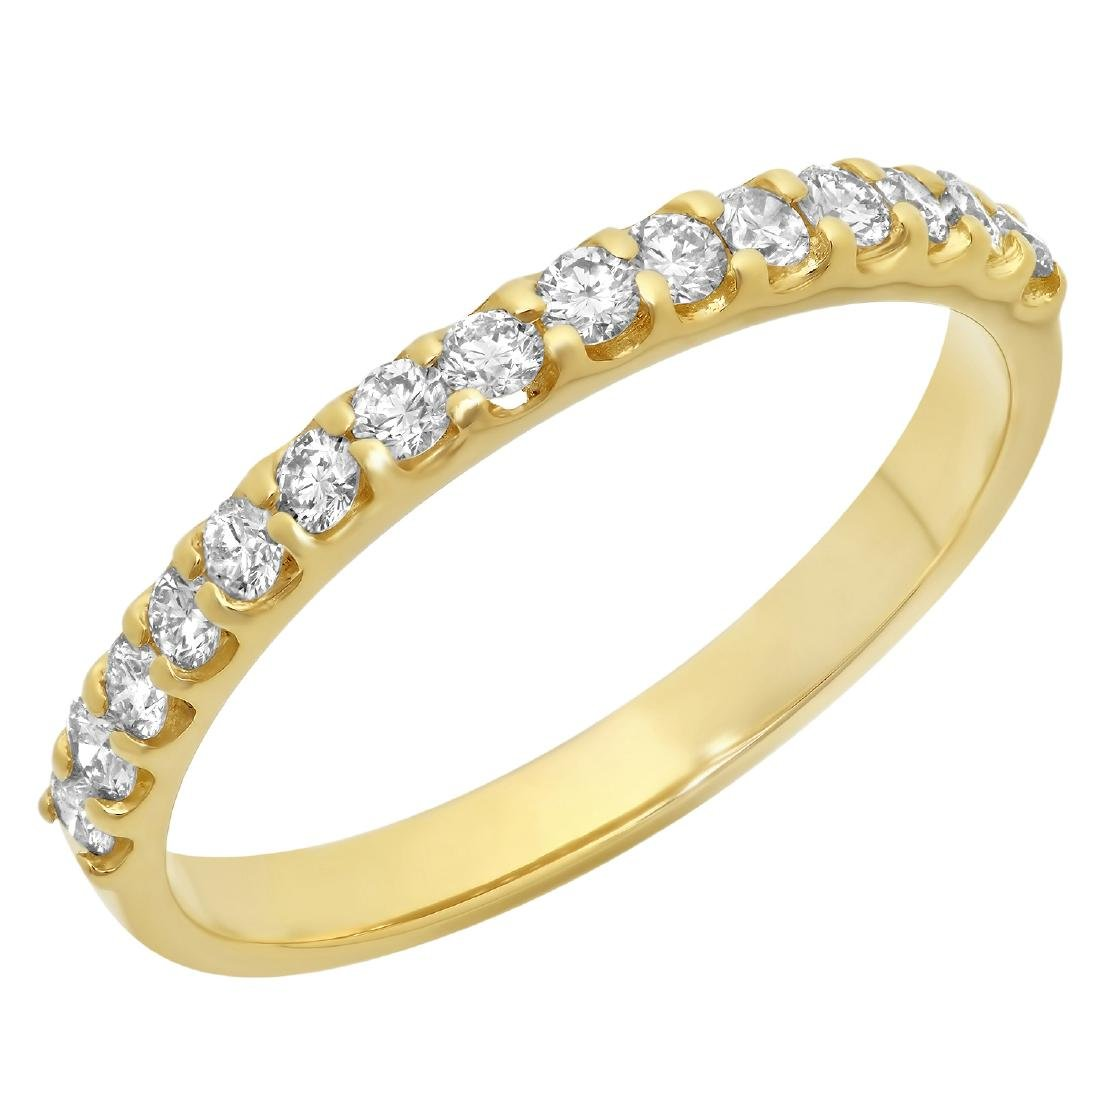 0.35 Carat Natural Diamond 18K Solid Yellow Gold Ring